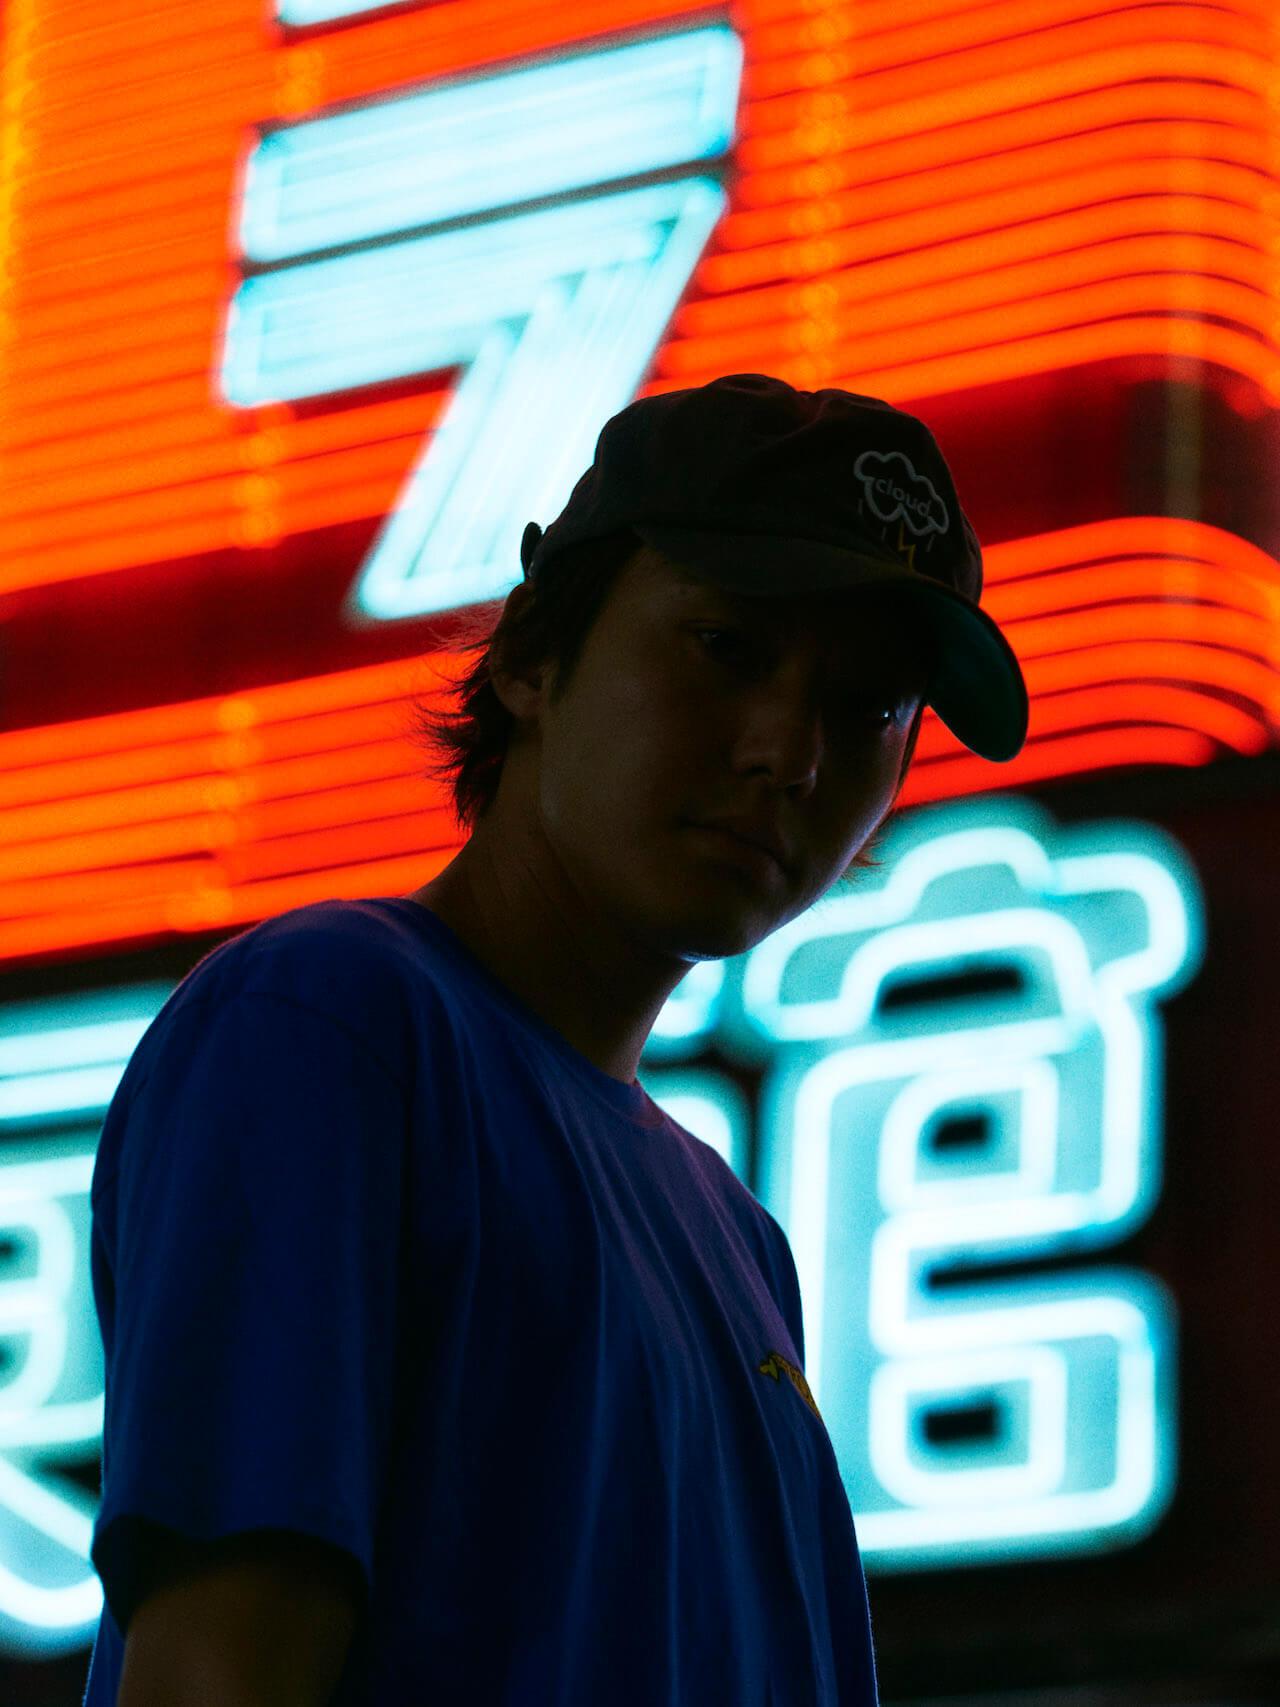 TENDOUJI×フジロック|東京オルタナシーン屈指の愛されバンドに訊く、フジロック初出演の意気込み interview190722-tendouji-3